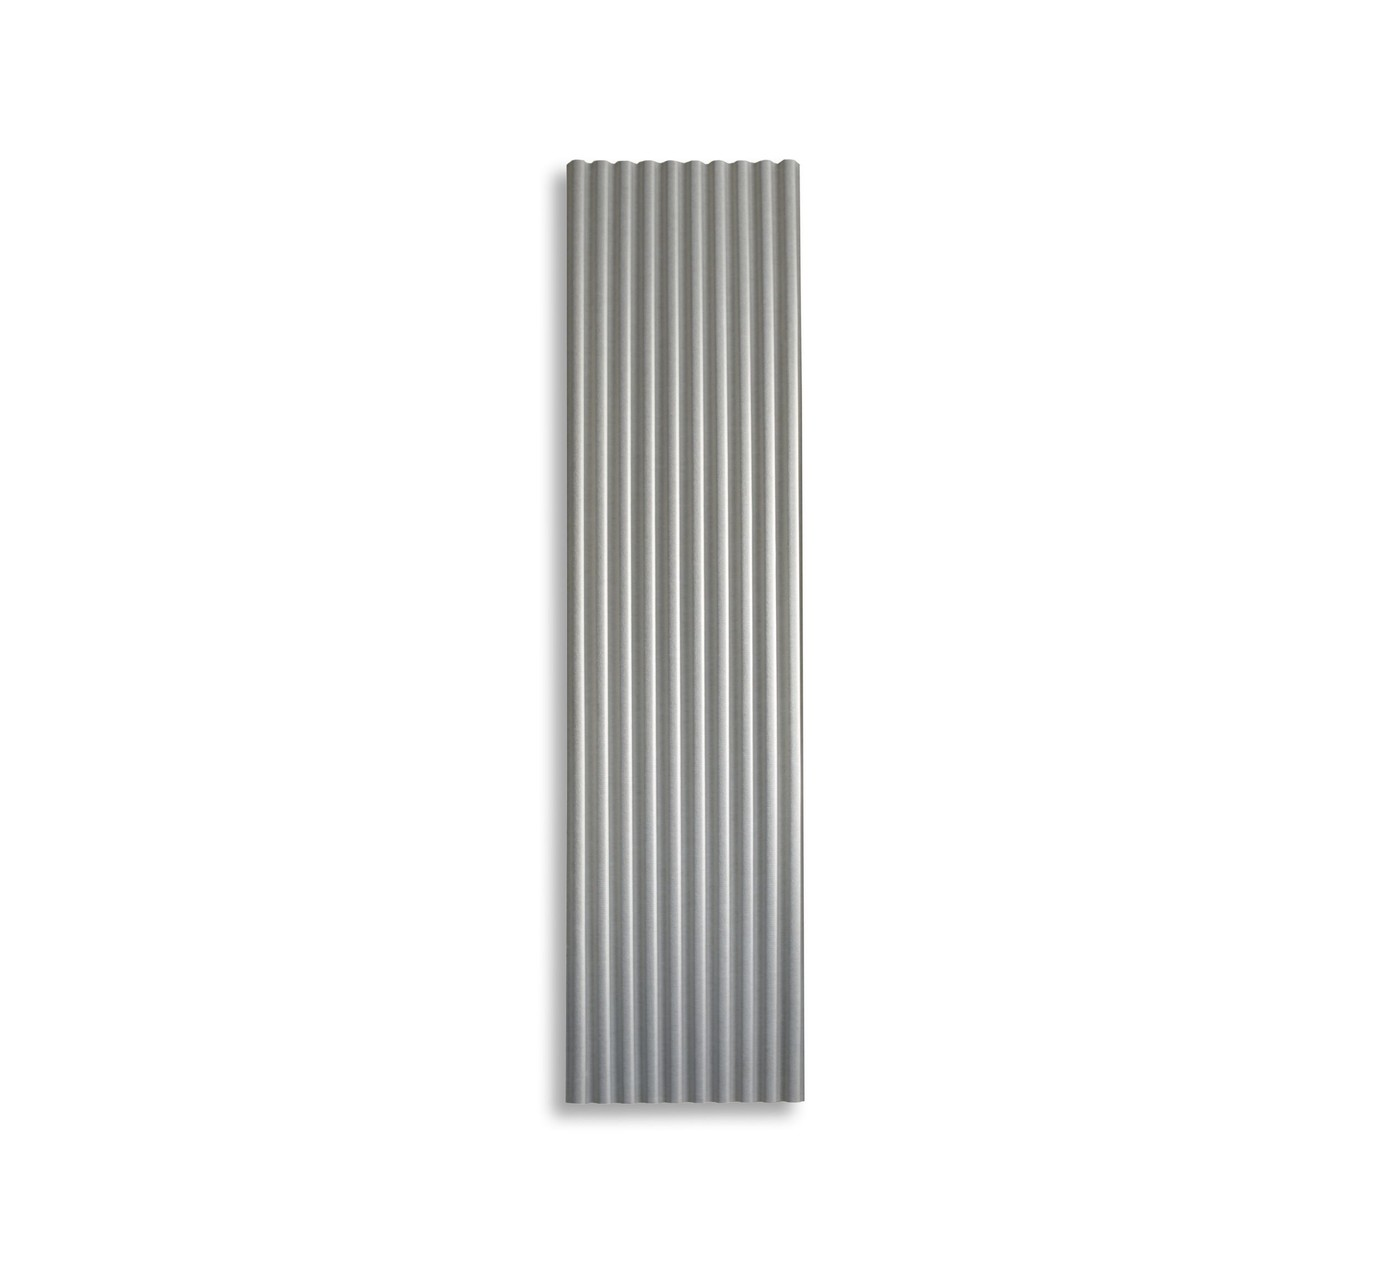 0-Control-Sonido-Paneles-Acusticos-Soundwave-Wall-1380